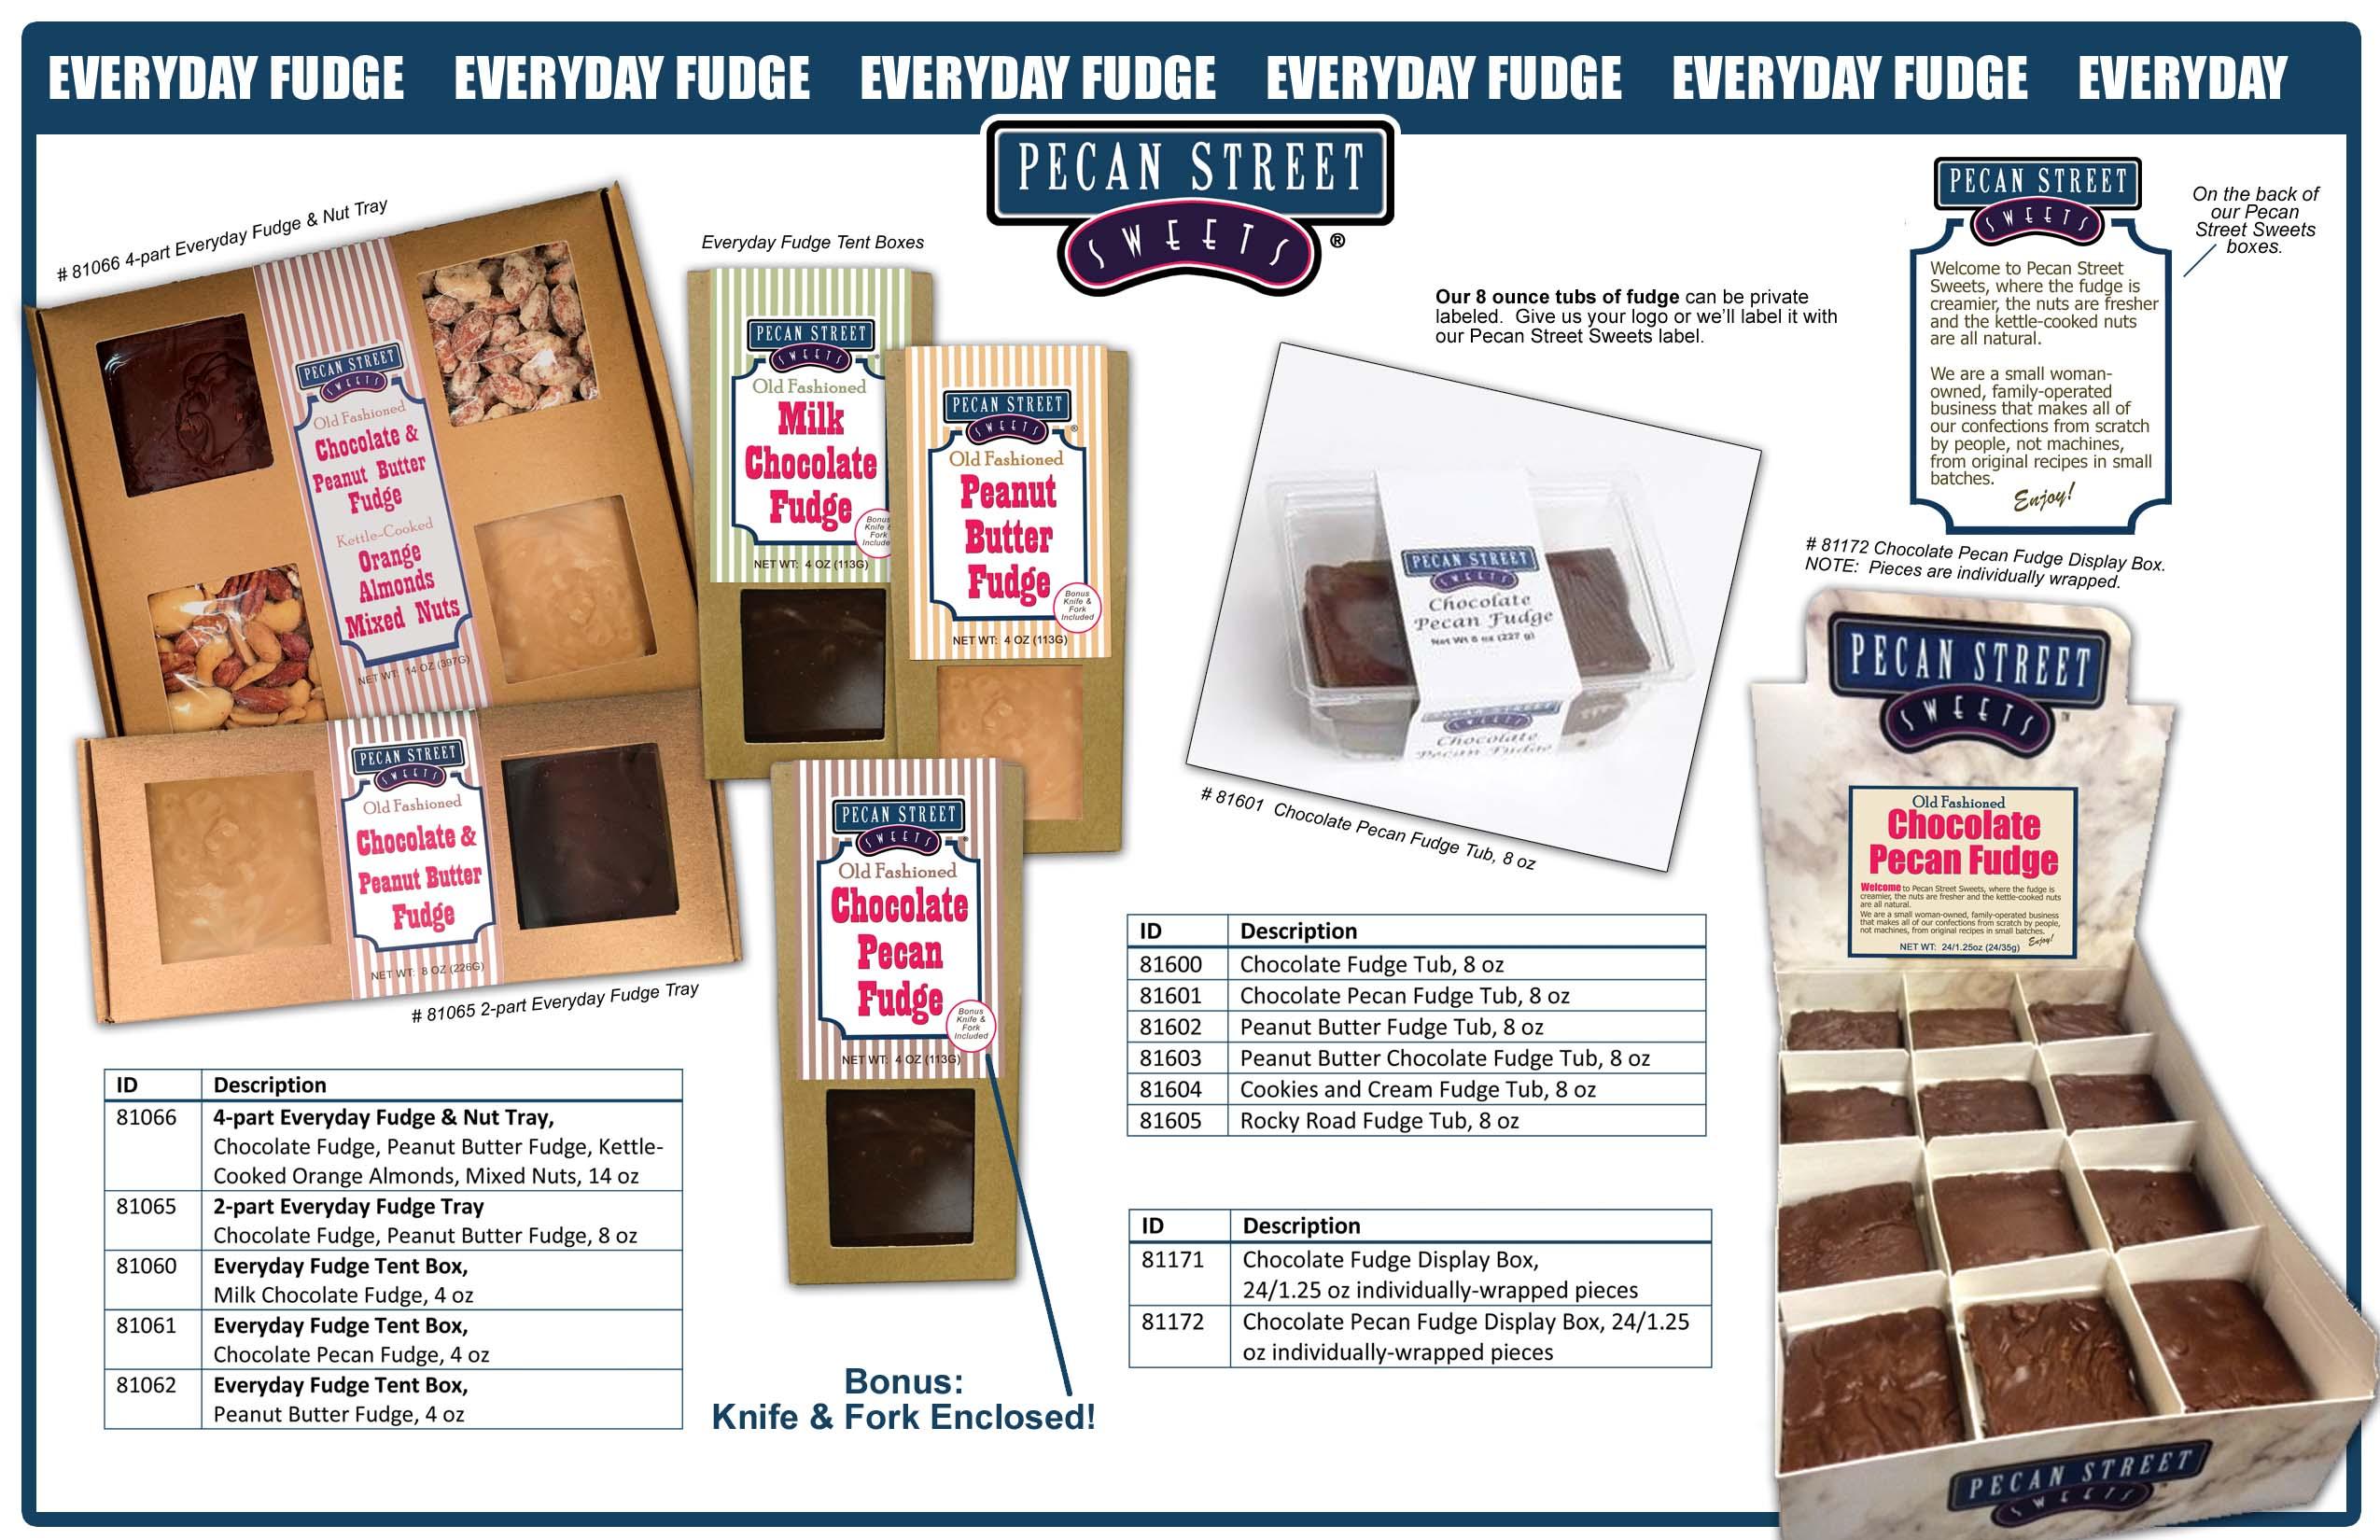 fudge-brochure-p-2-3-low-res-copy.jpg